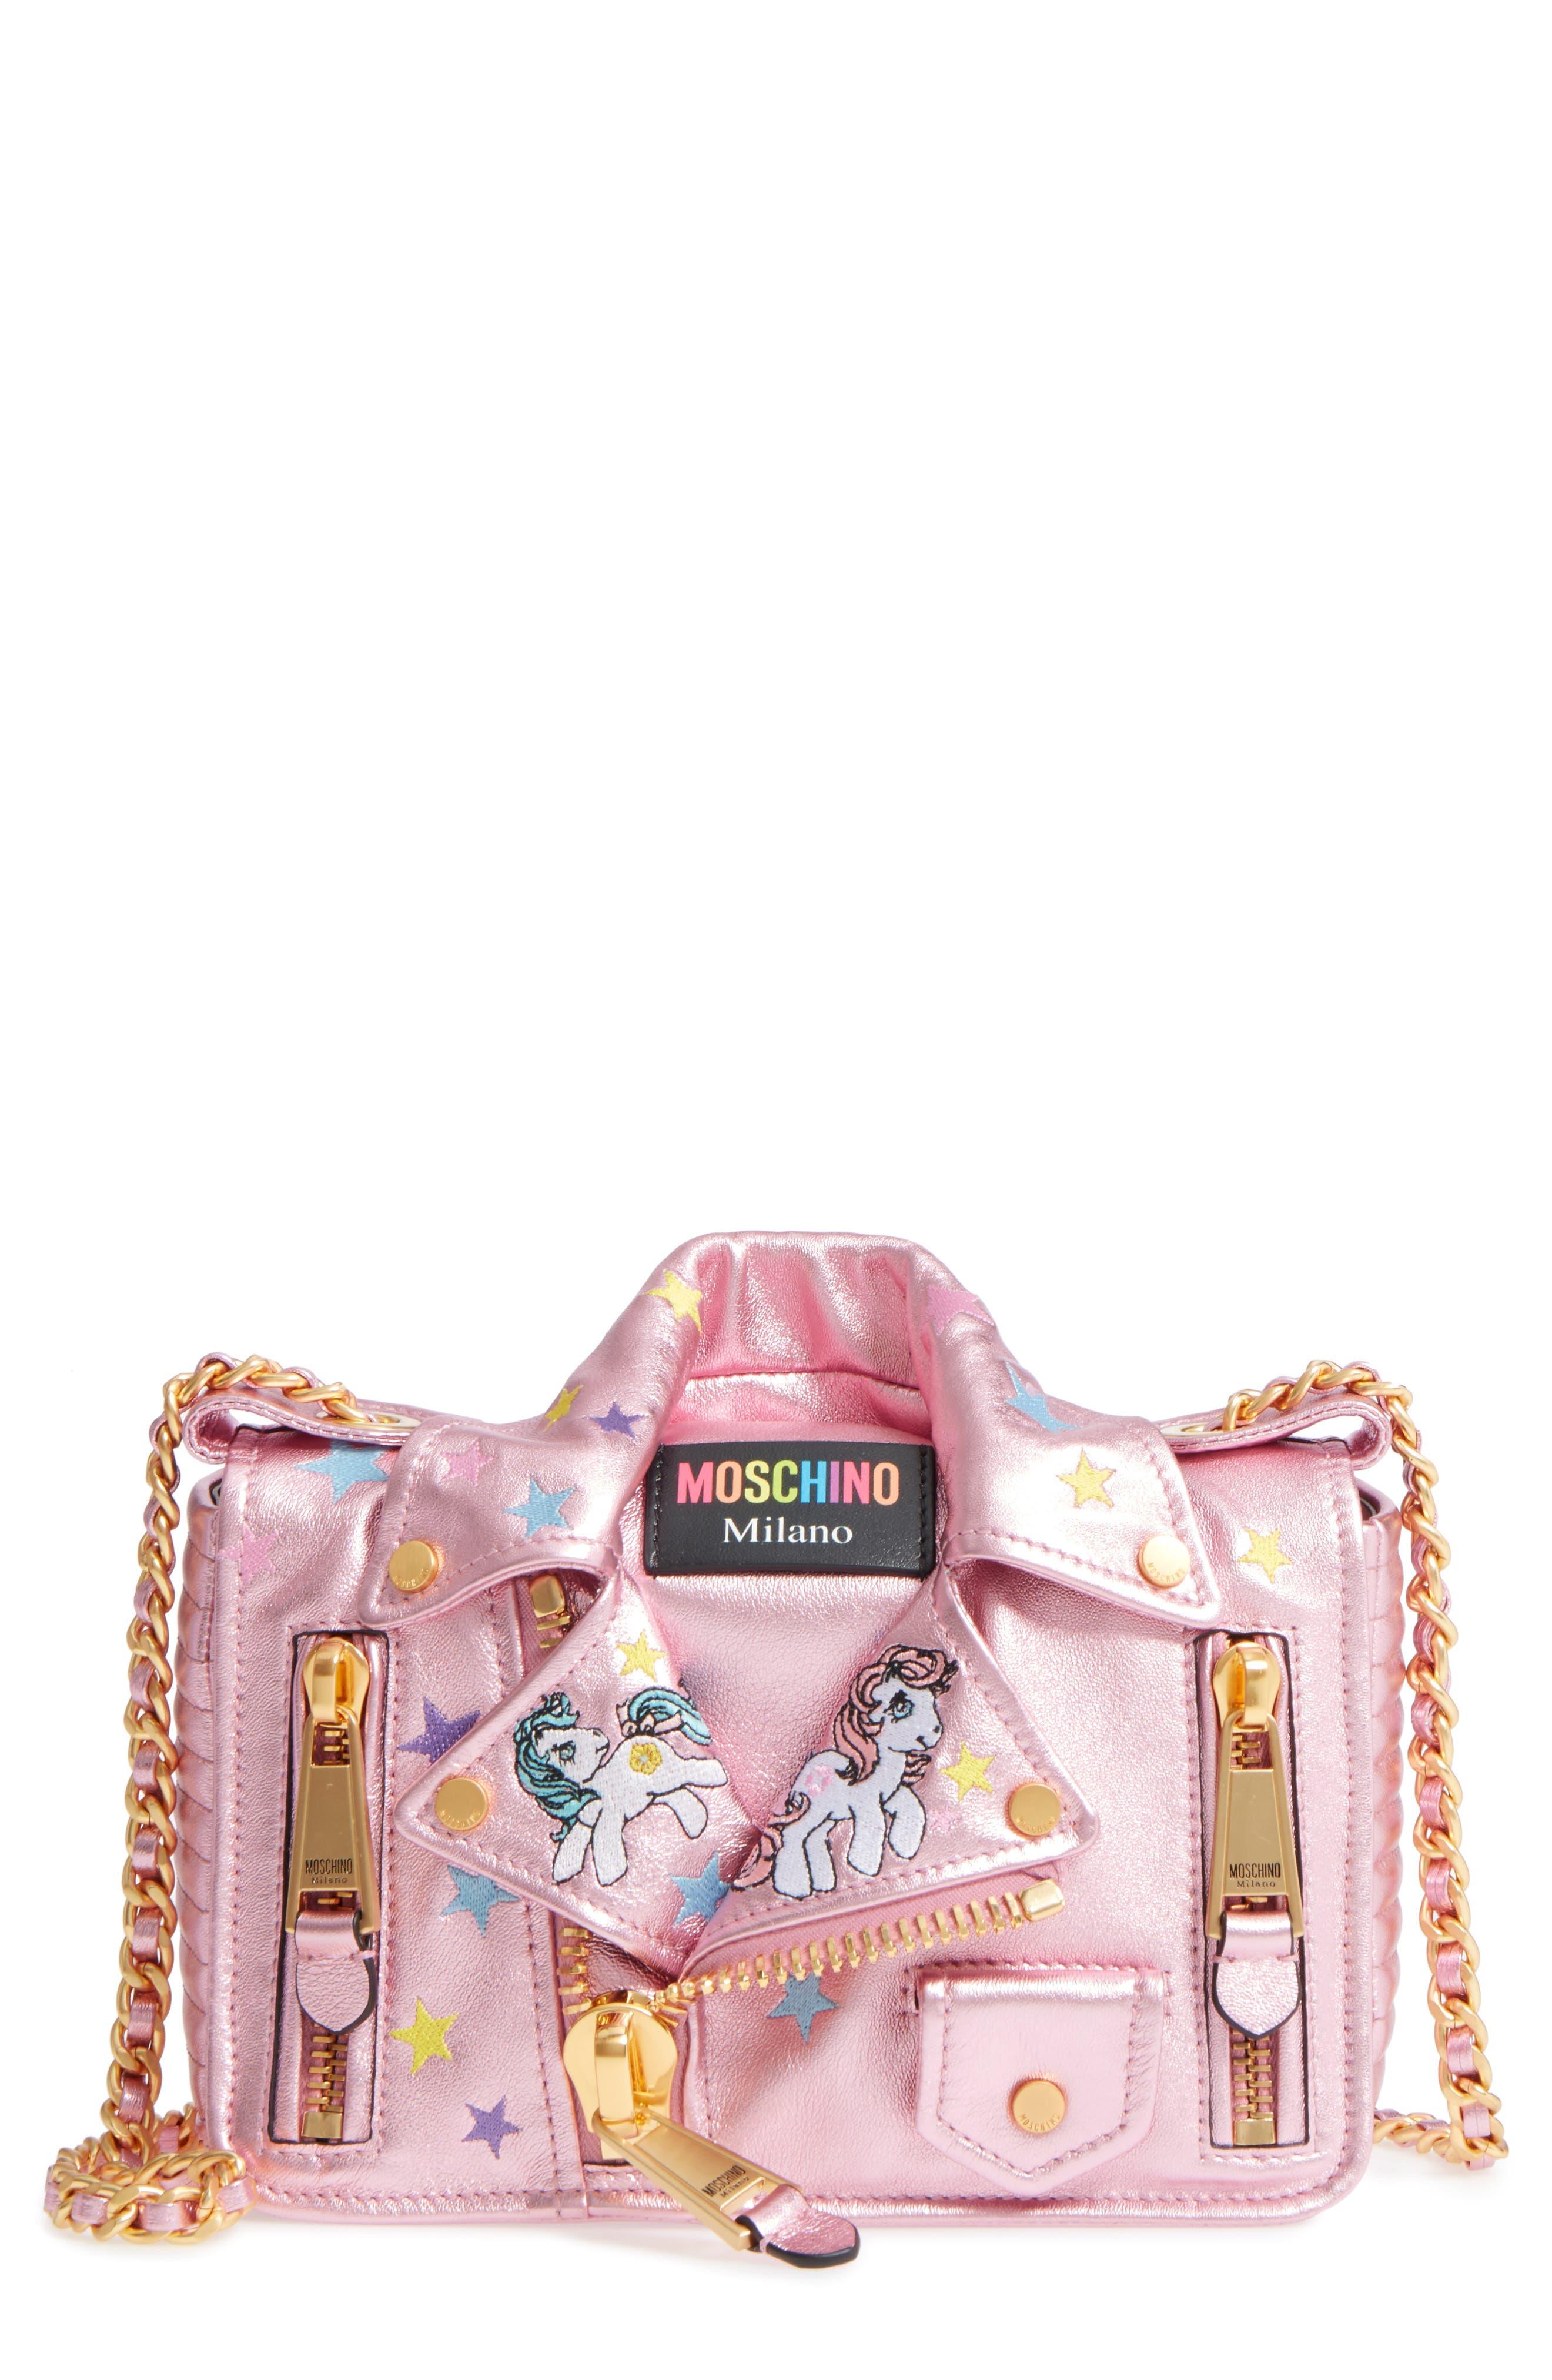 x My Little Pony Biker Jacket Metallic Leather Crossbody Bag,                         Main,                         color, Pink